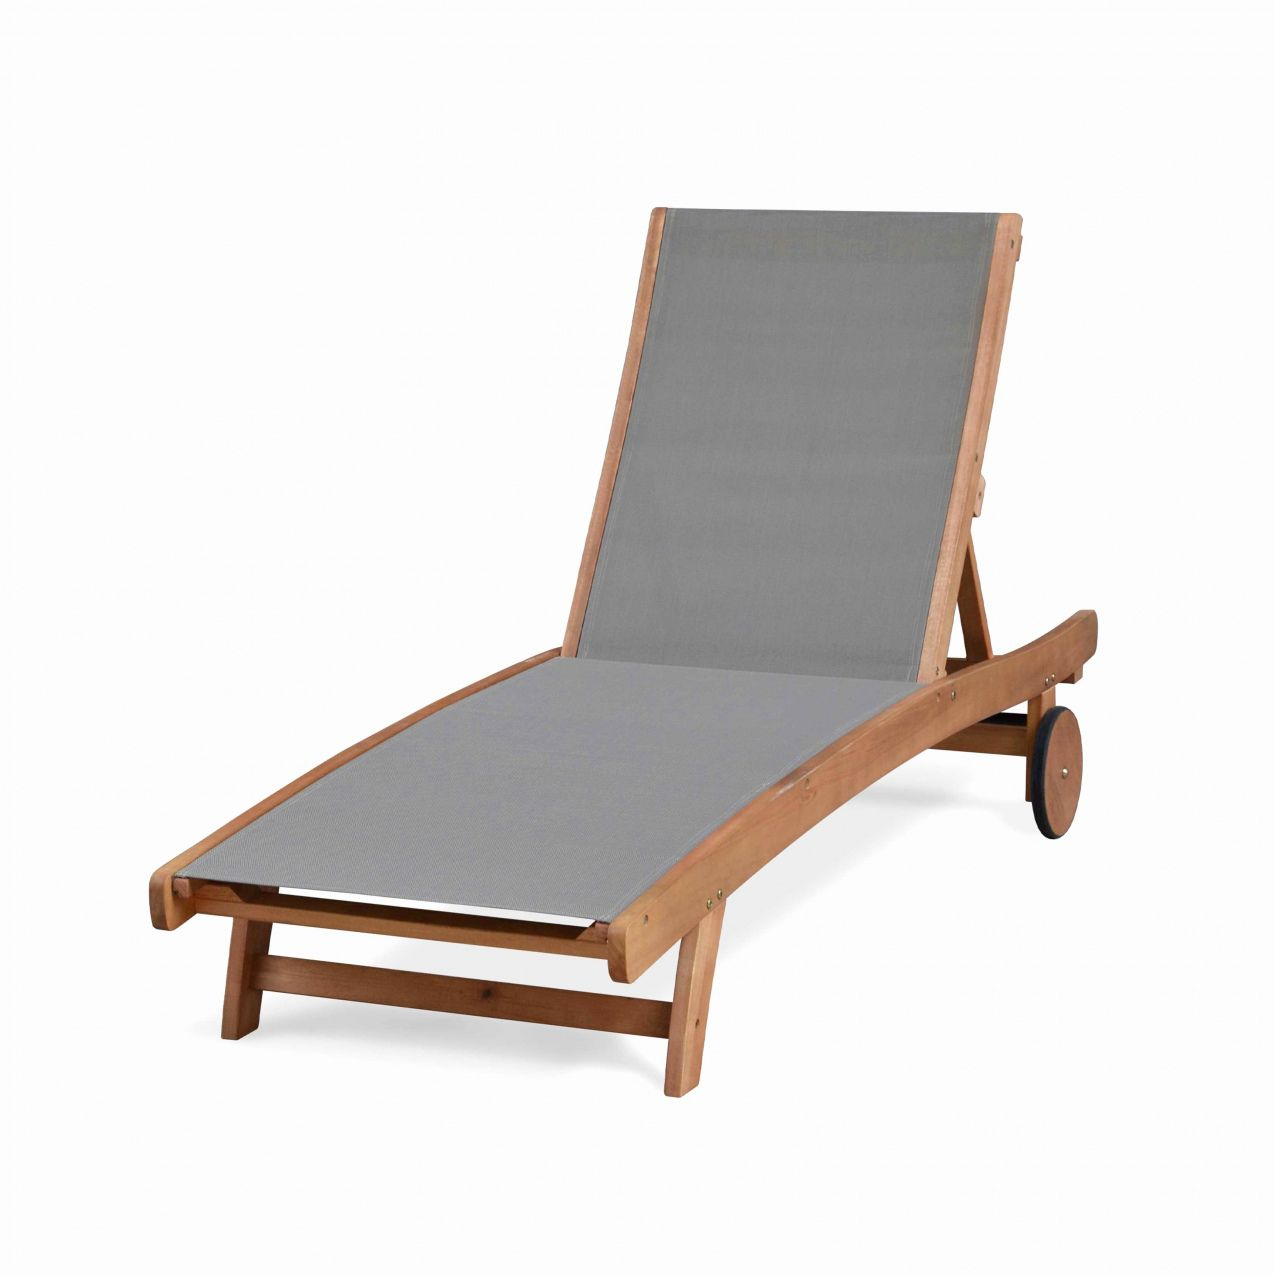 70 Chaise Pliante Foir Fouille 2017 Check More At Https Www Unionjacktrooper Com 55 Chaise Pliante Foir Fouille 2018 Outdoor Furniture Outdoor Decor Decor